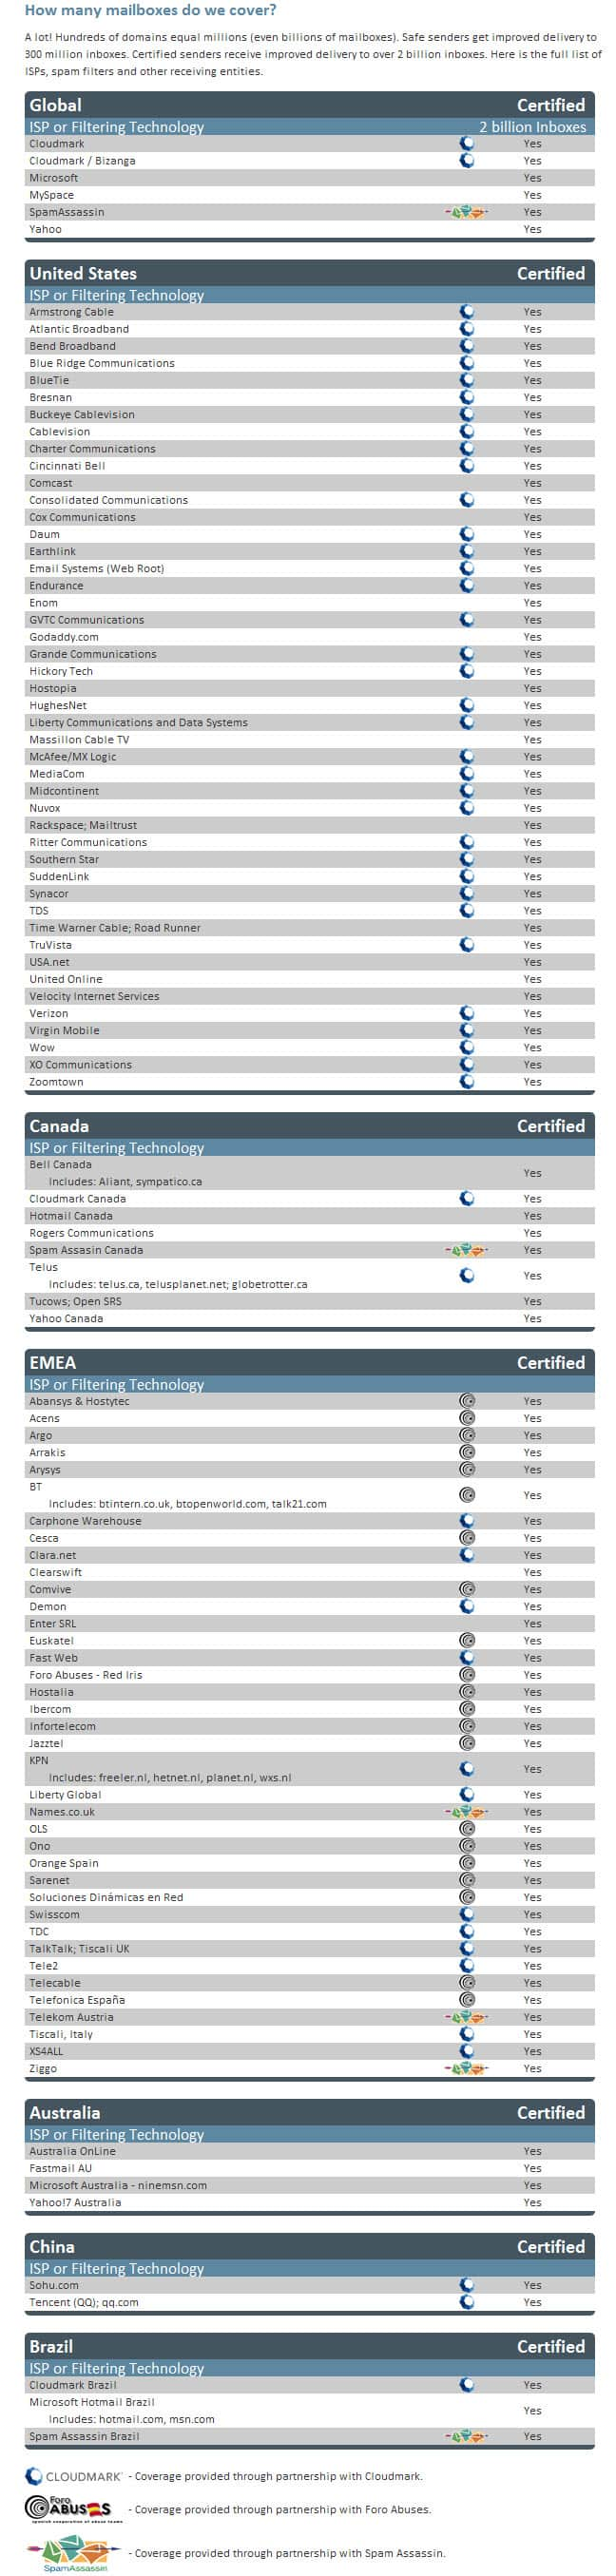 ReturnPath Certification | Smtp Hero